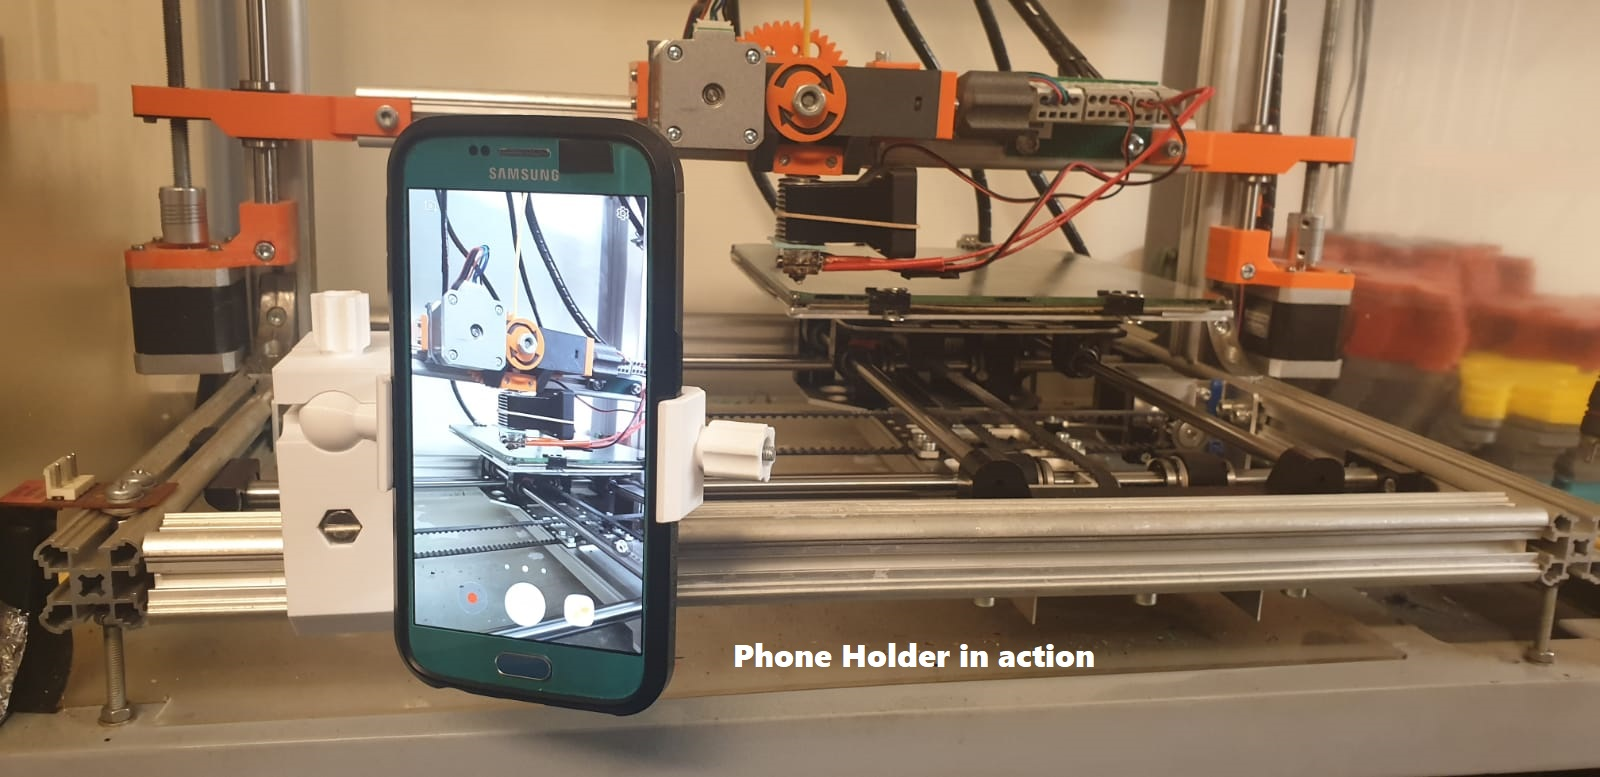 20190816-WA0001.jpg Download STL file Universal Arm • 3D printable template, Job